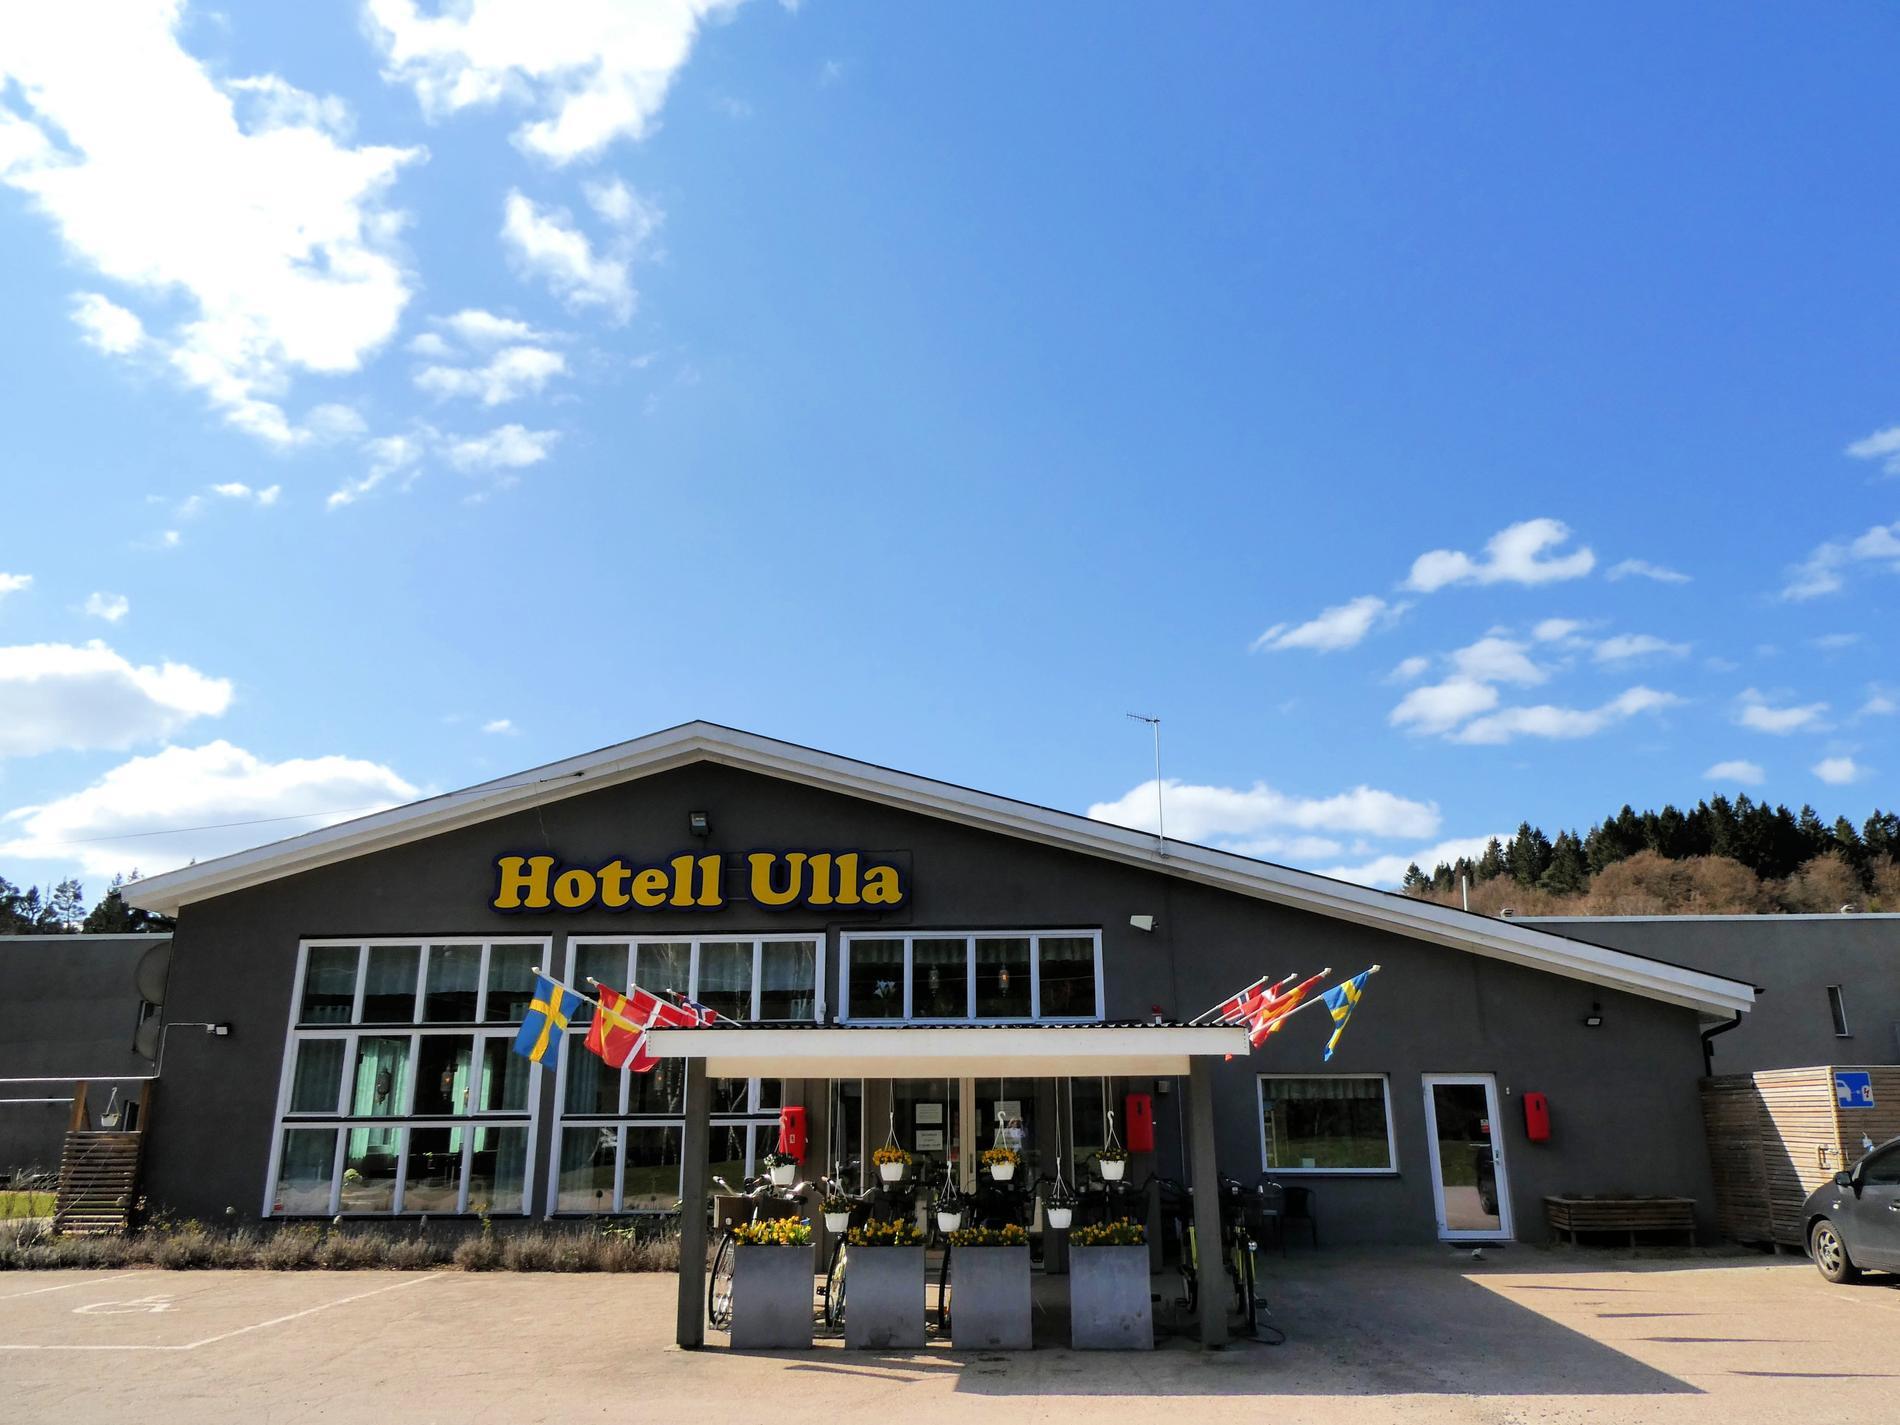 Hotell Ulla.